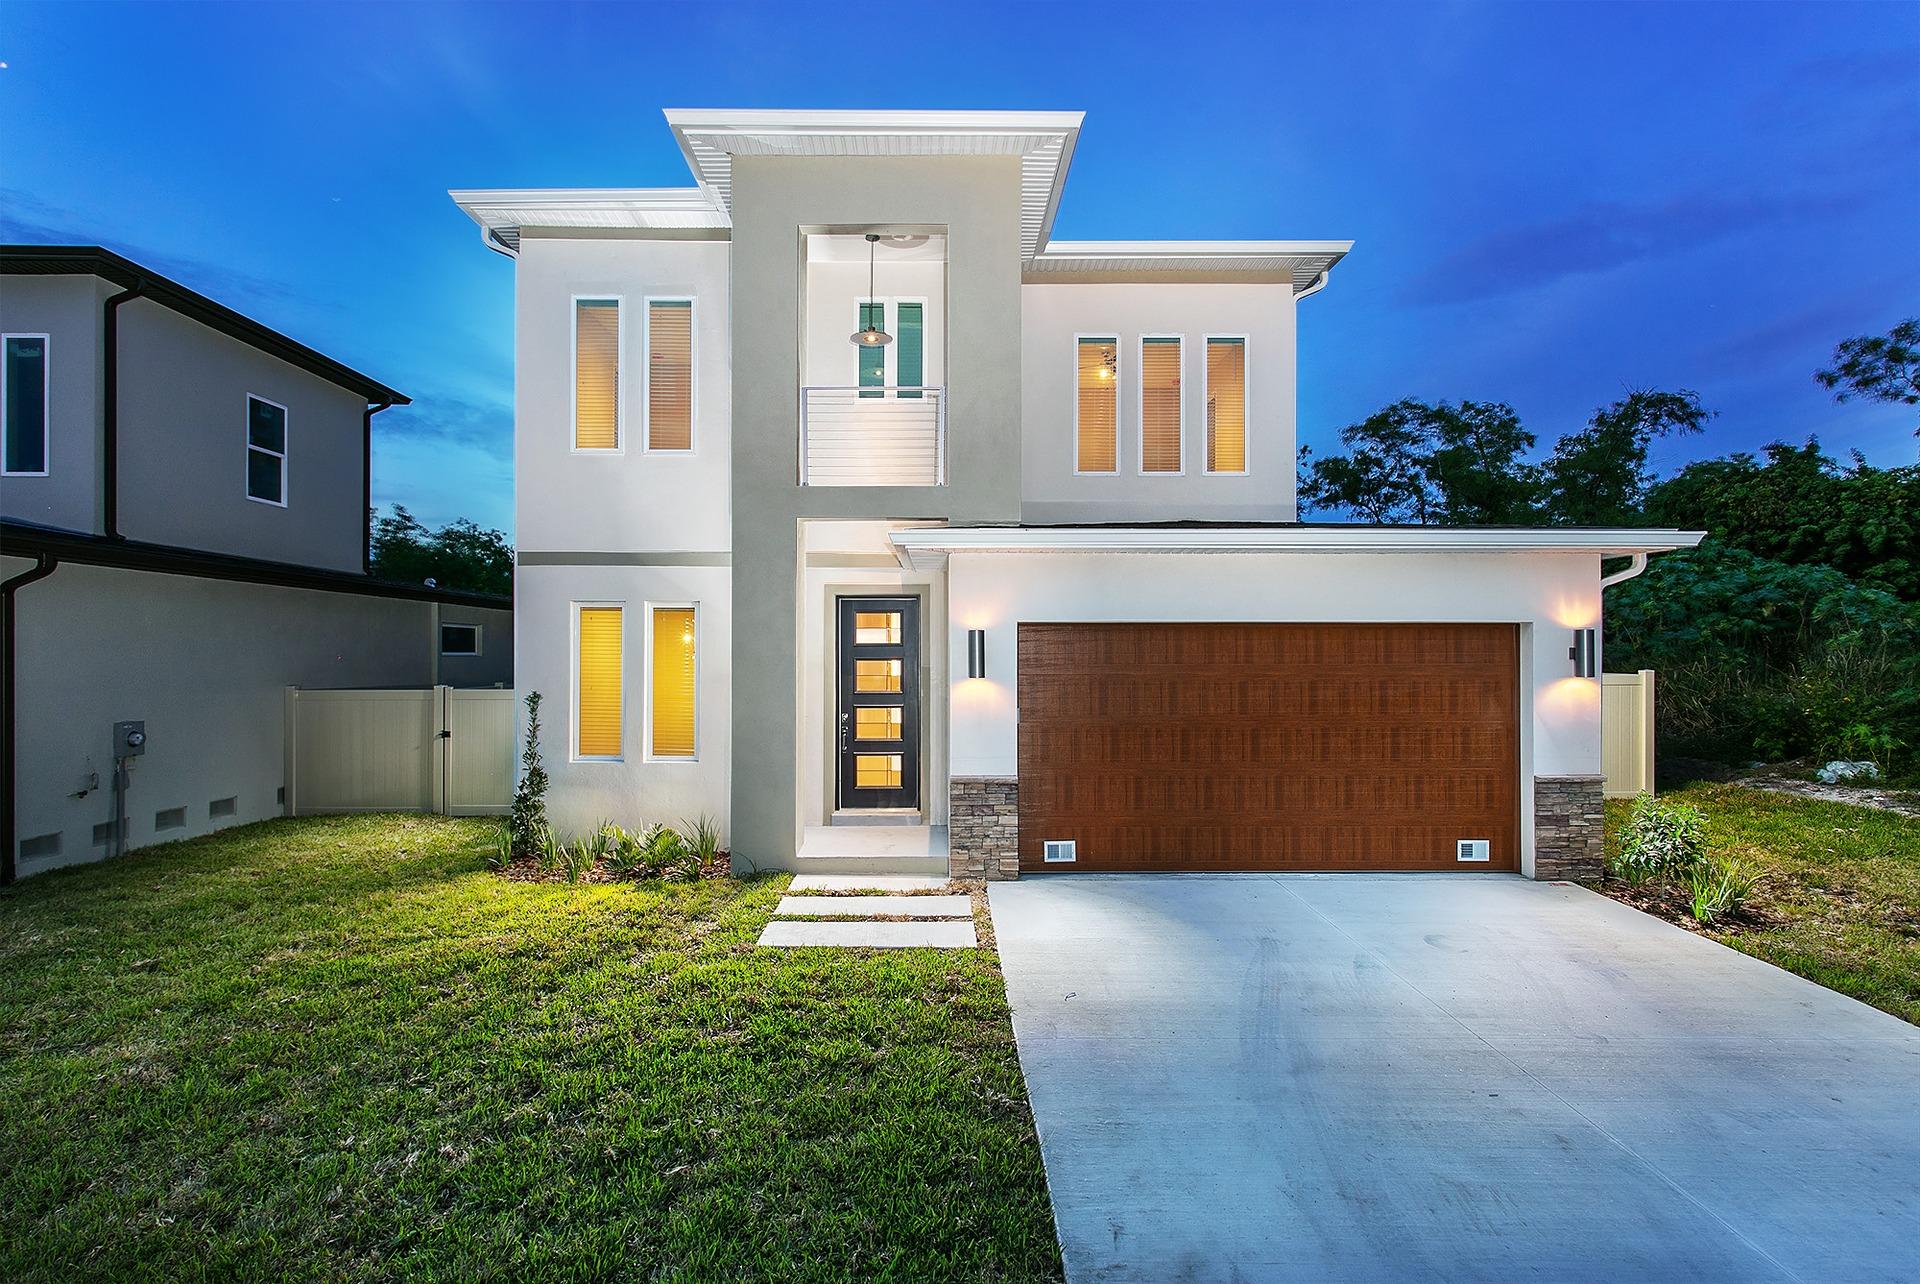 4419 W Richardson Ave Tampa, FL 33616